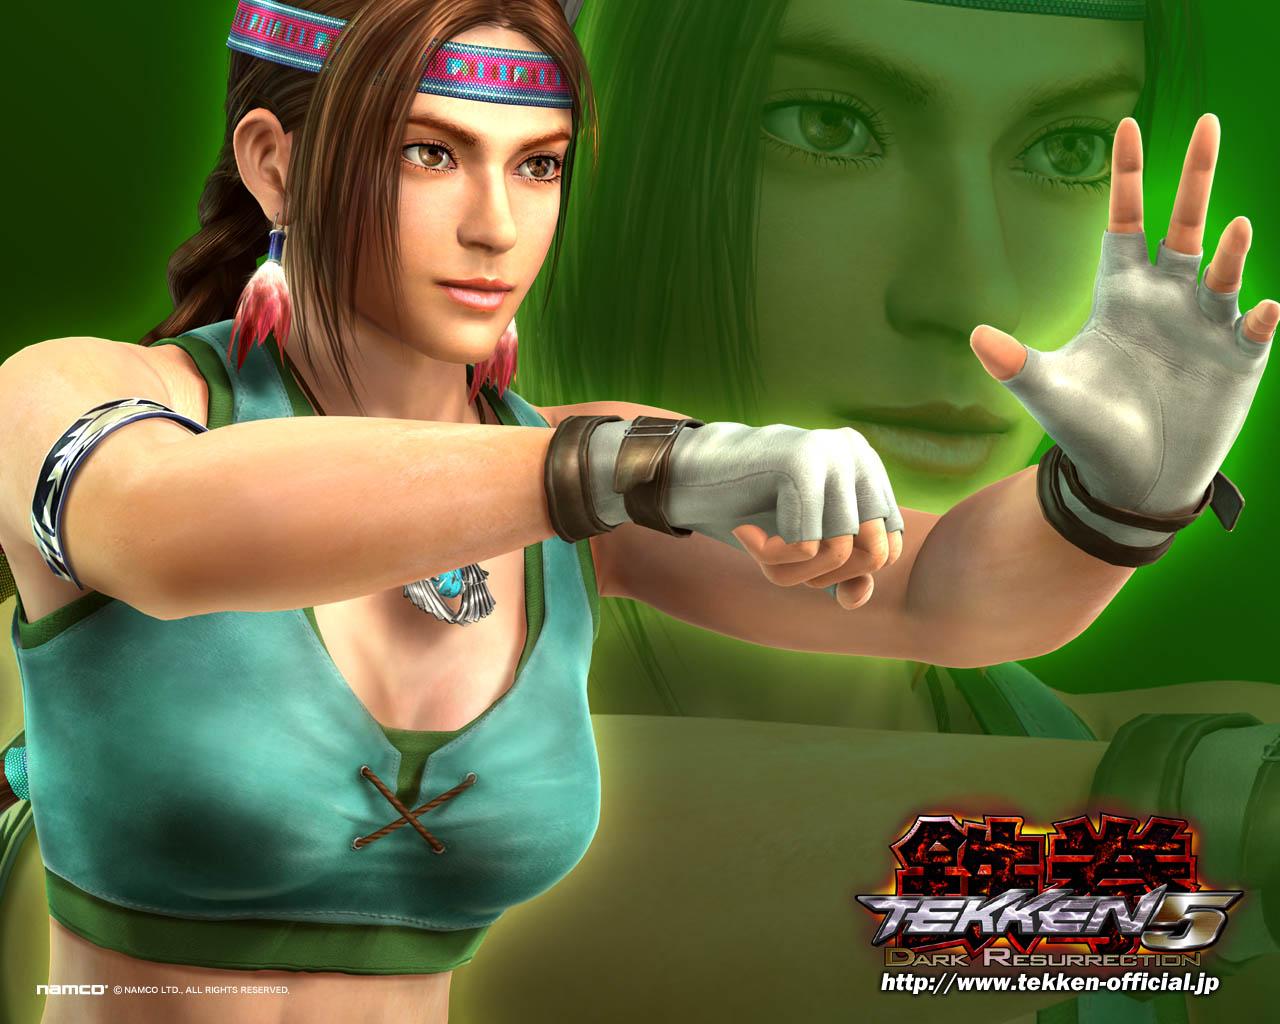 Tekken 5 Dark Resurrection Image Id 332084 Image Abyss